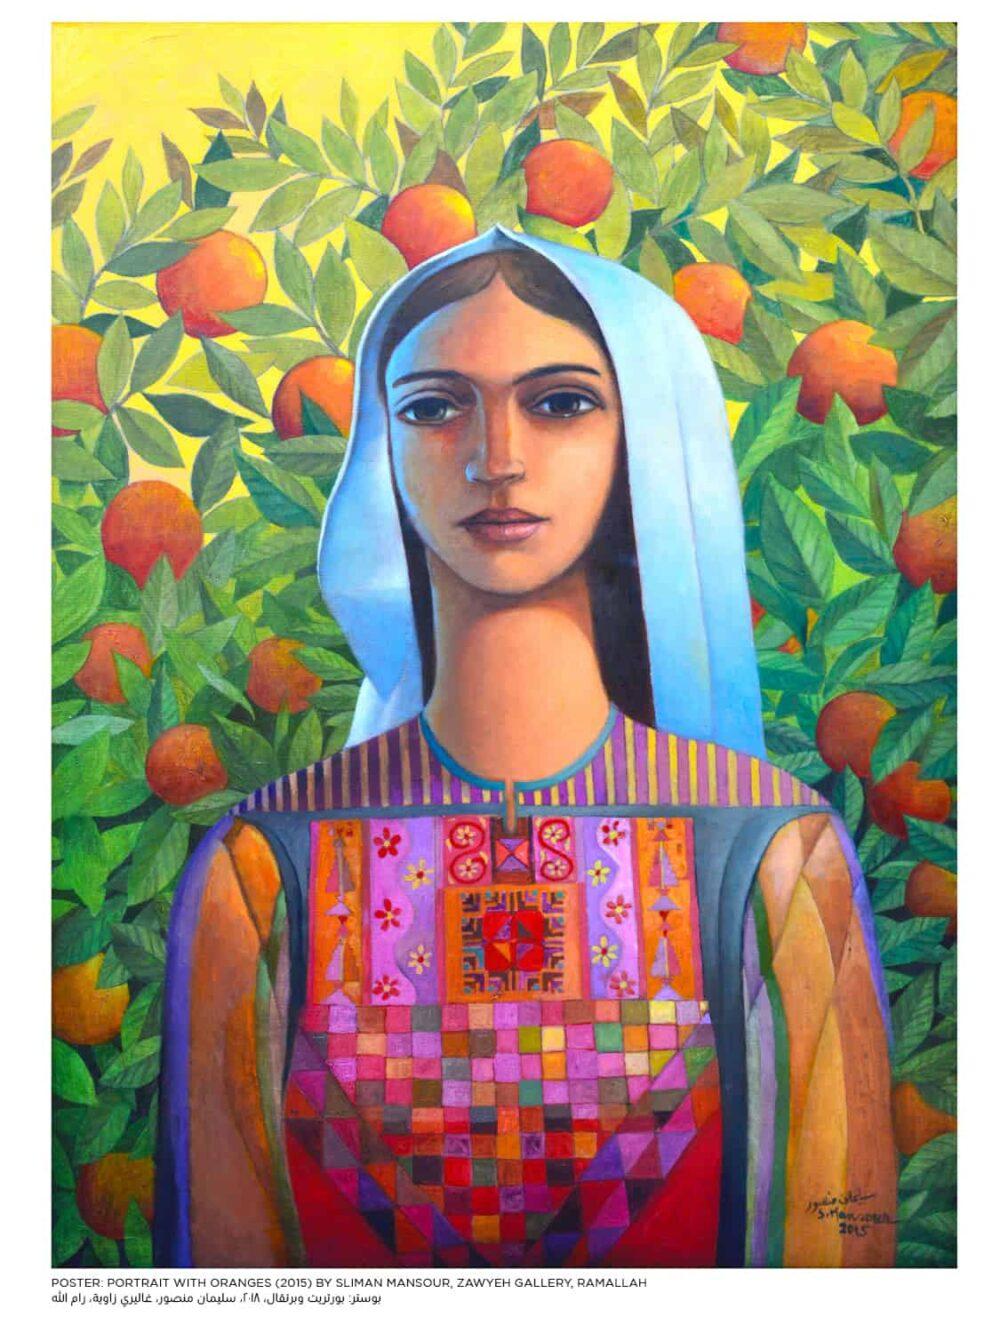 Portrait with Oranges by Sliman Mansour